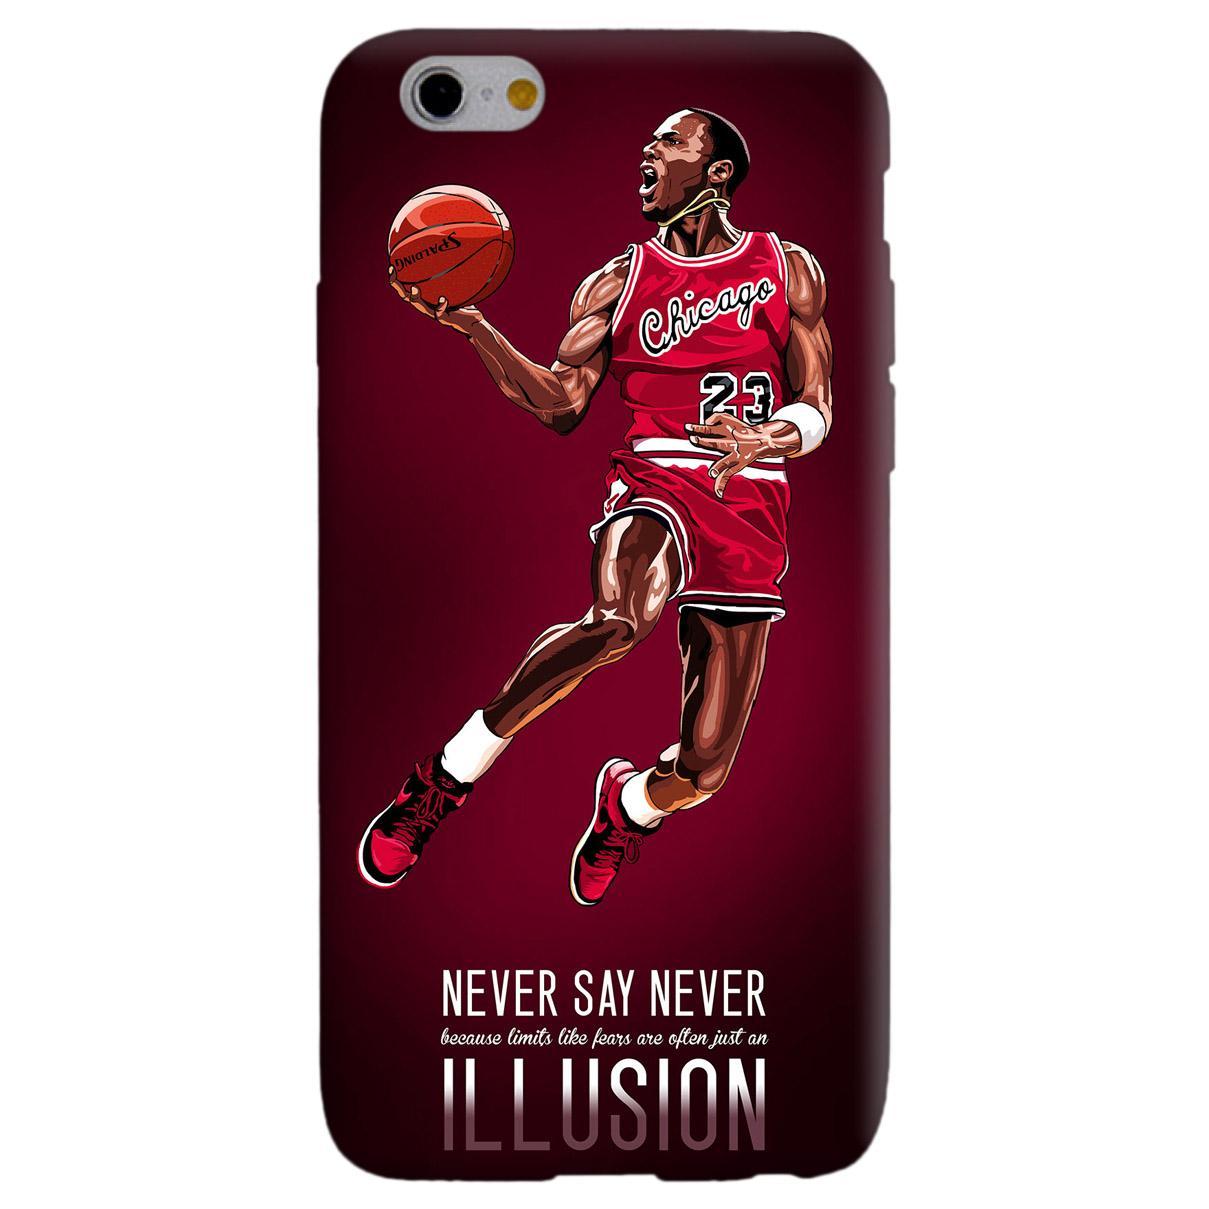 JORDAN NEVER SAY NEVER cover per iphone